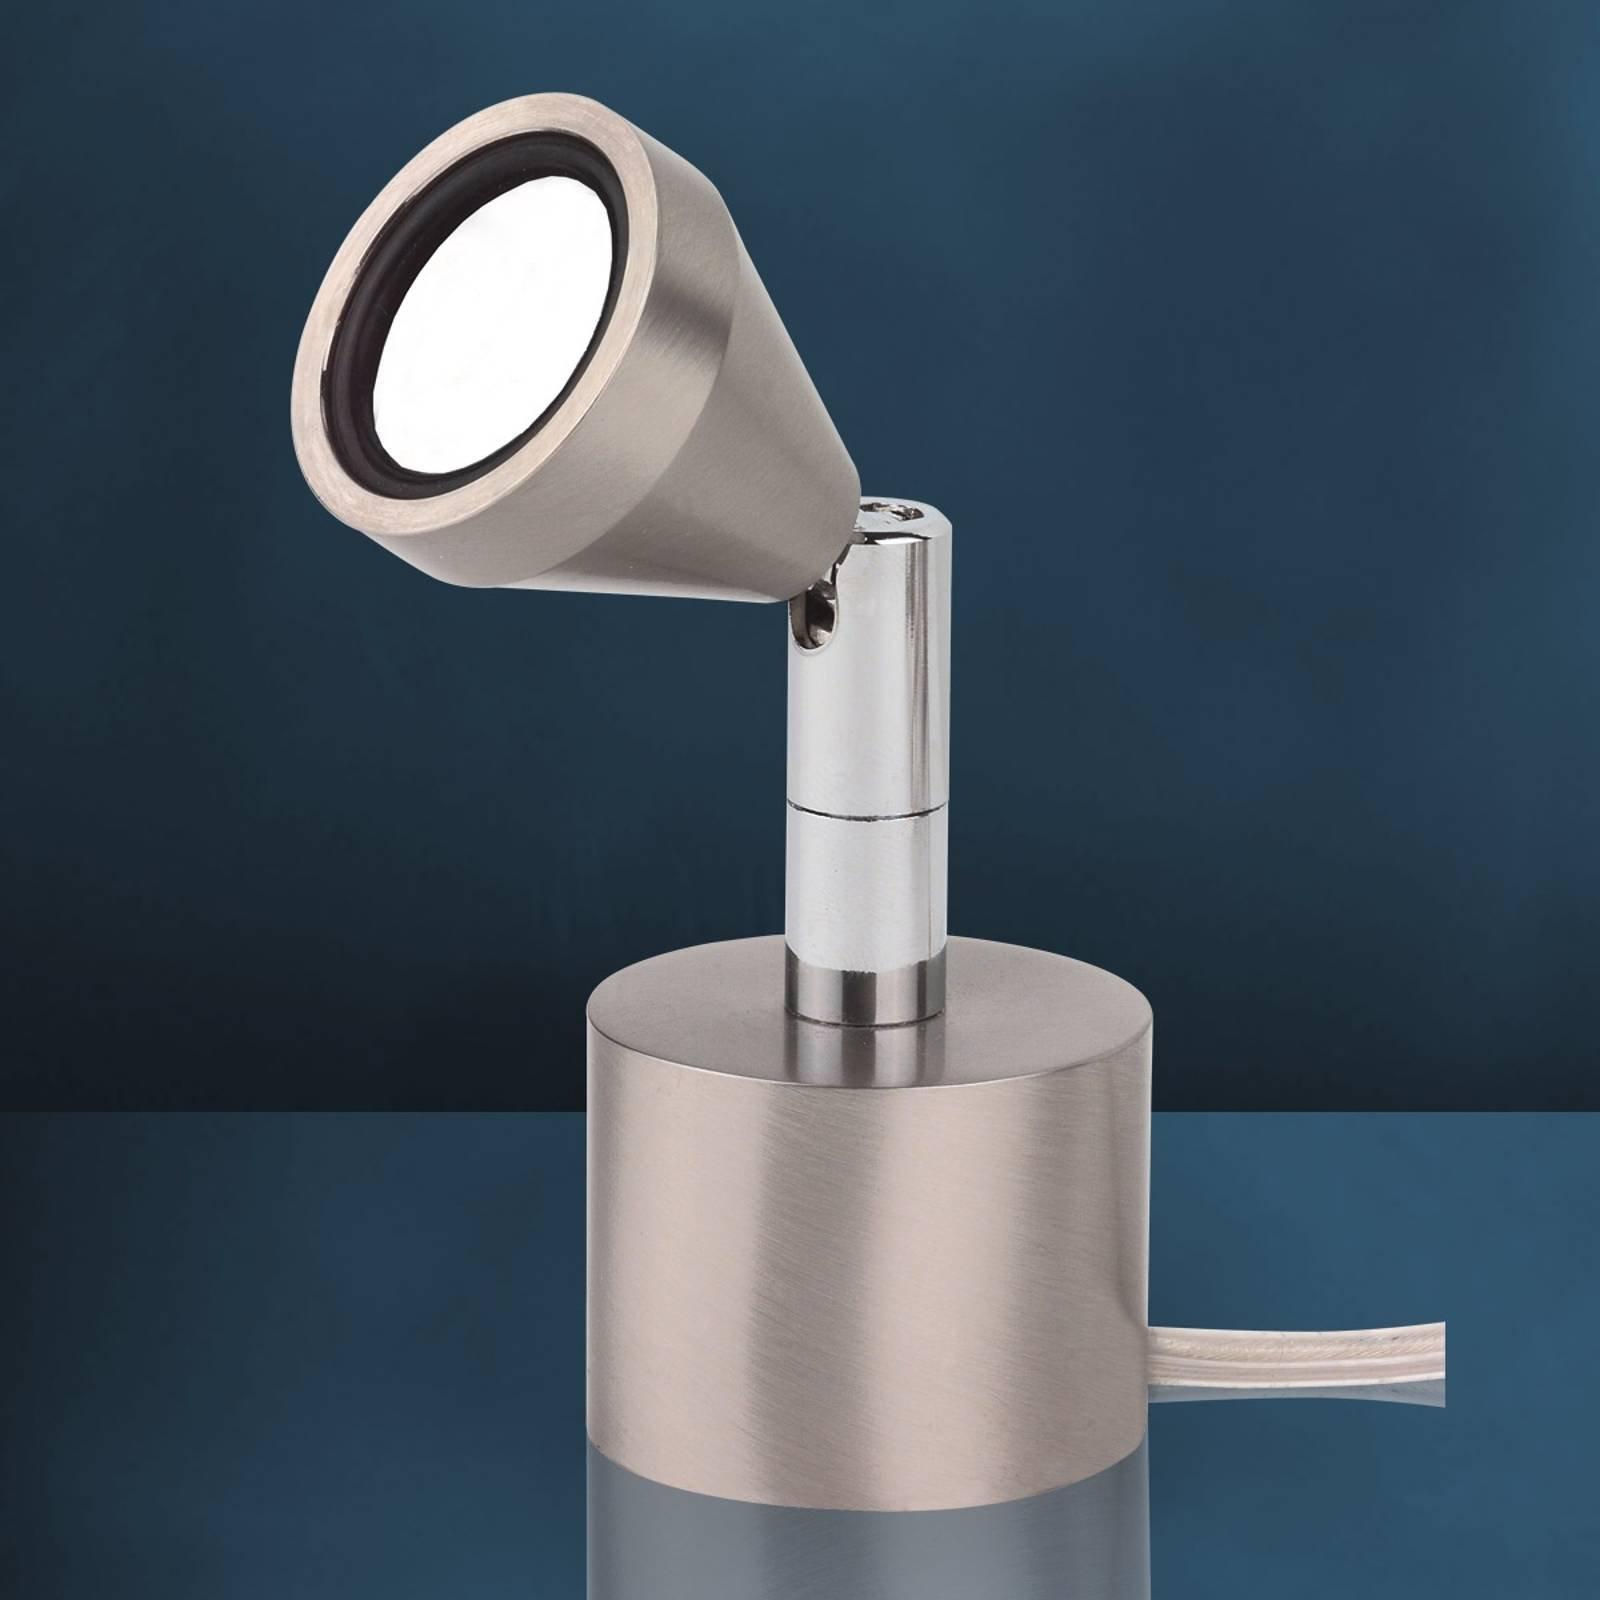 Flott MINI LED-bordlampe med varmhvitt lys